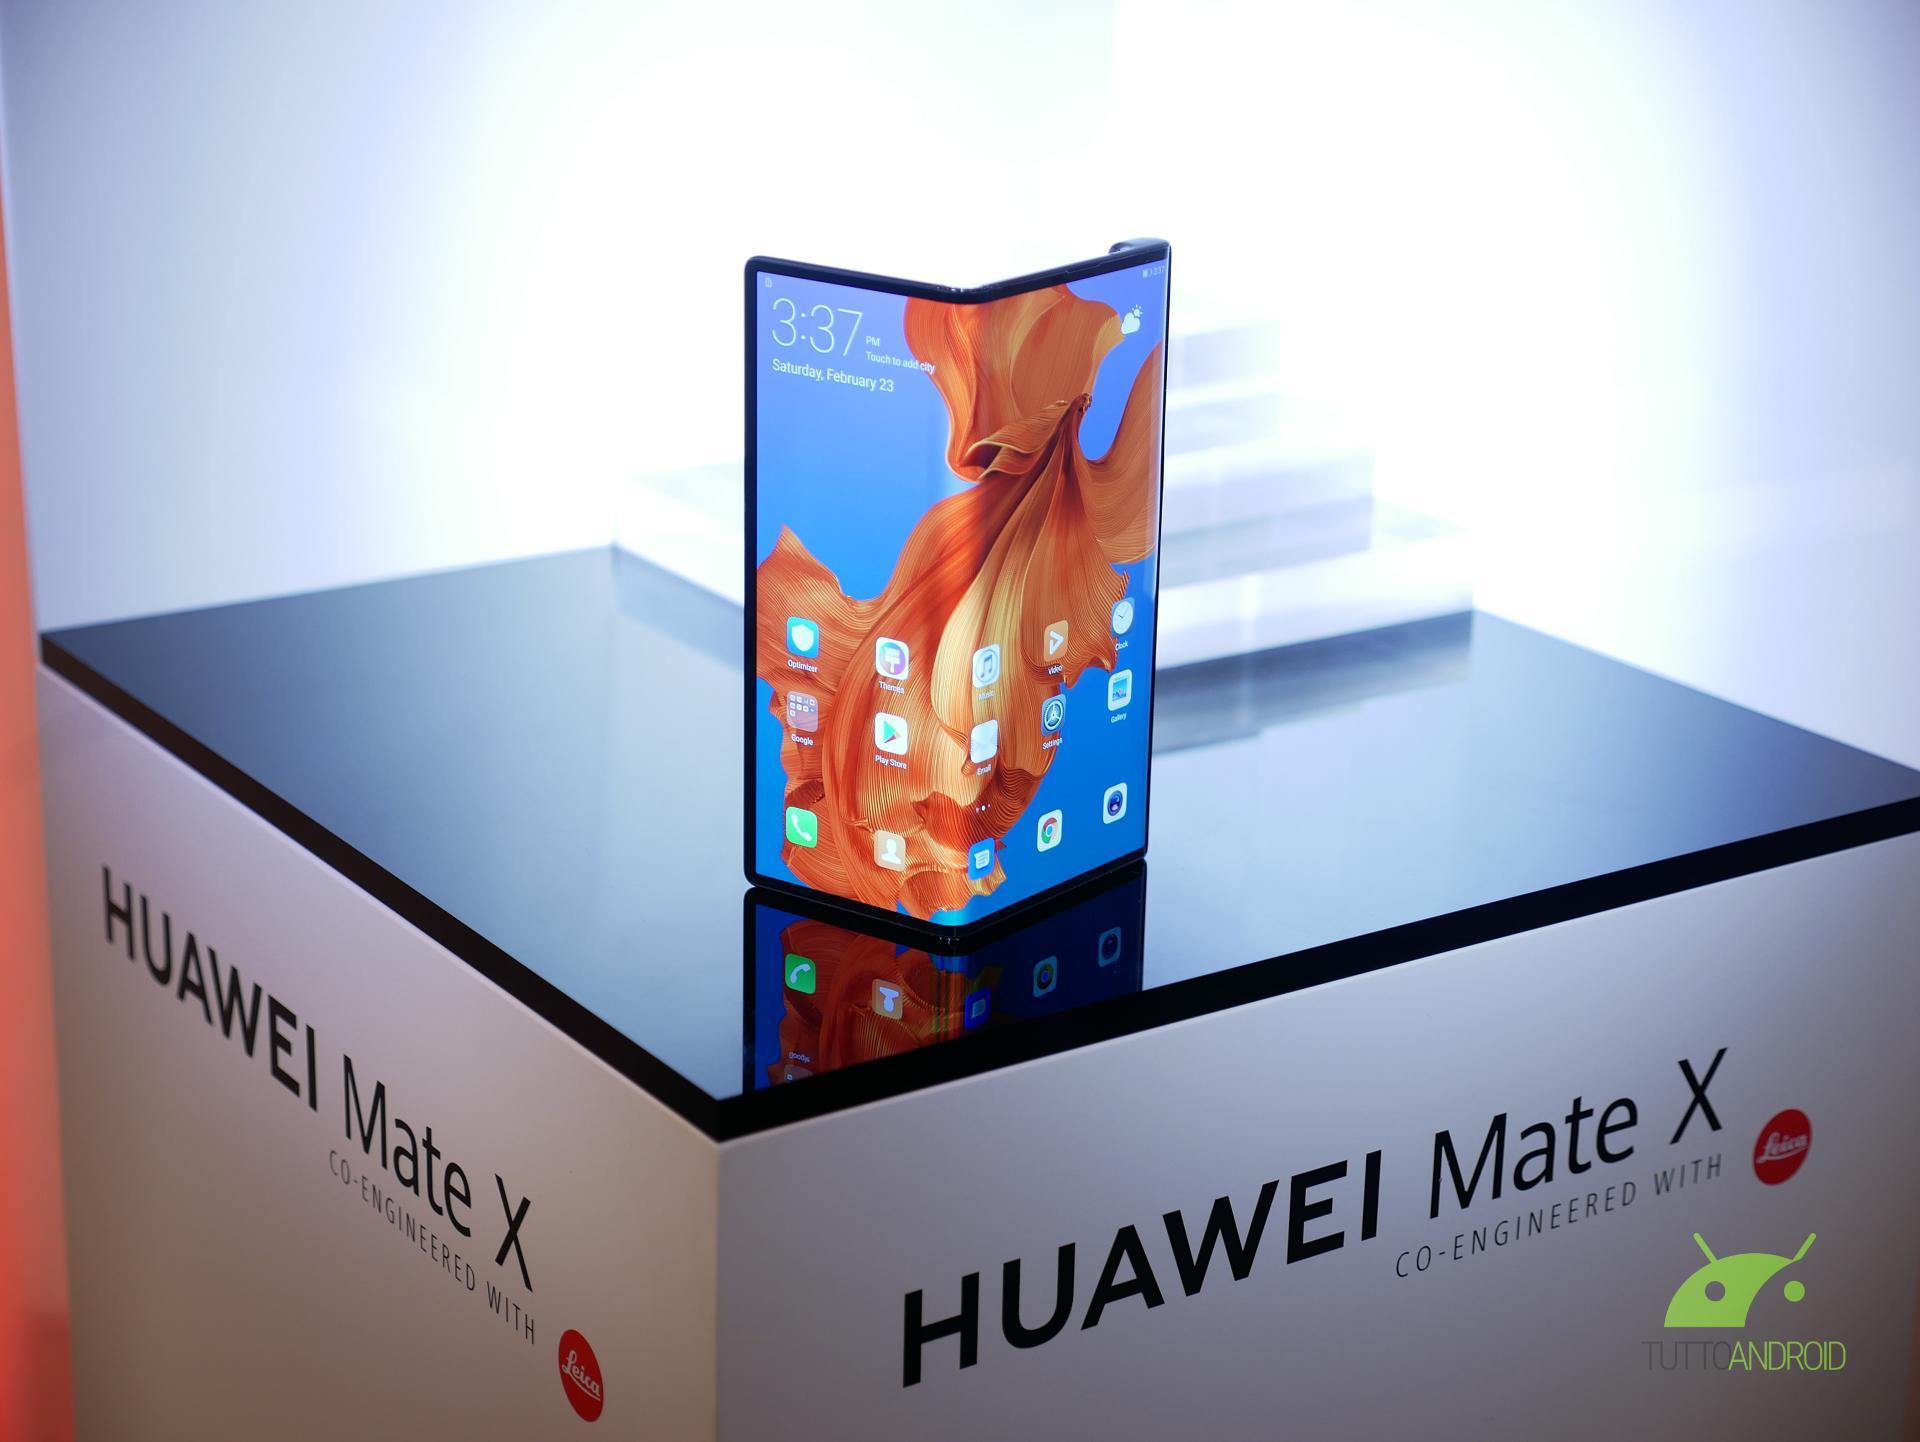 Huawei Mate X sbarcherà in Europa con Tre